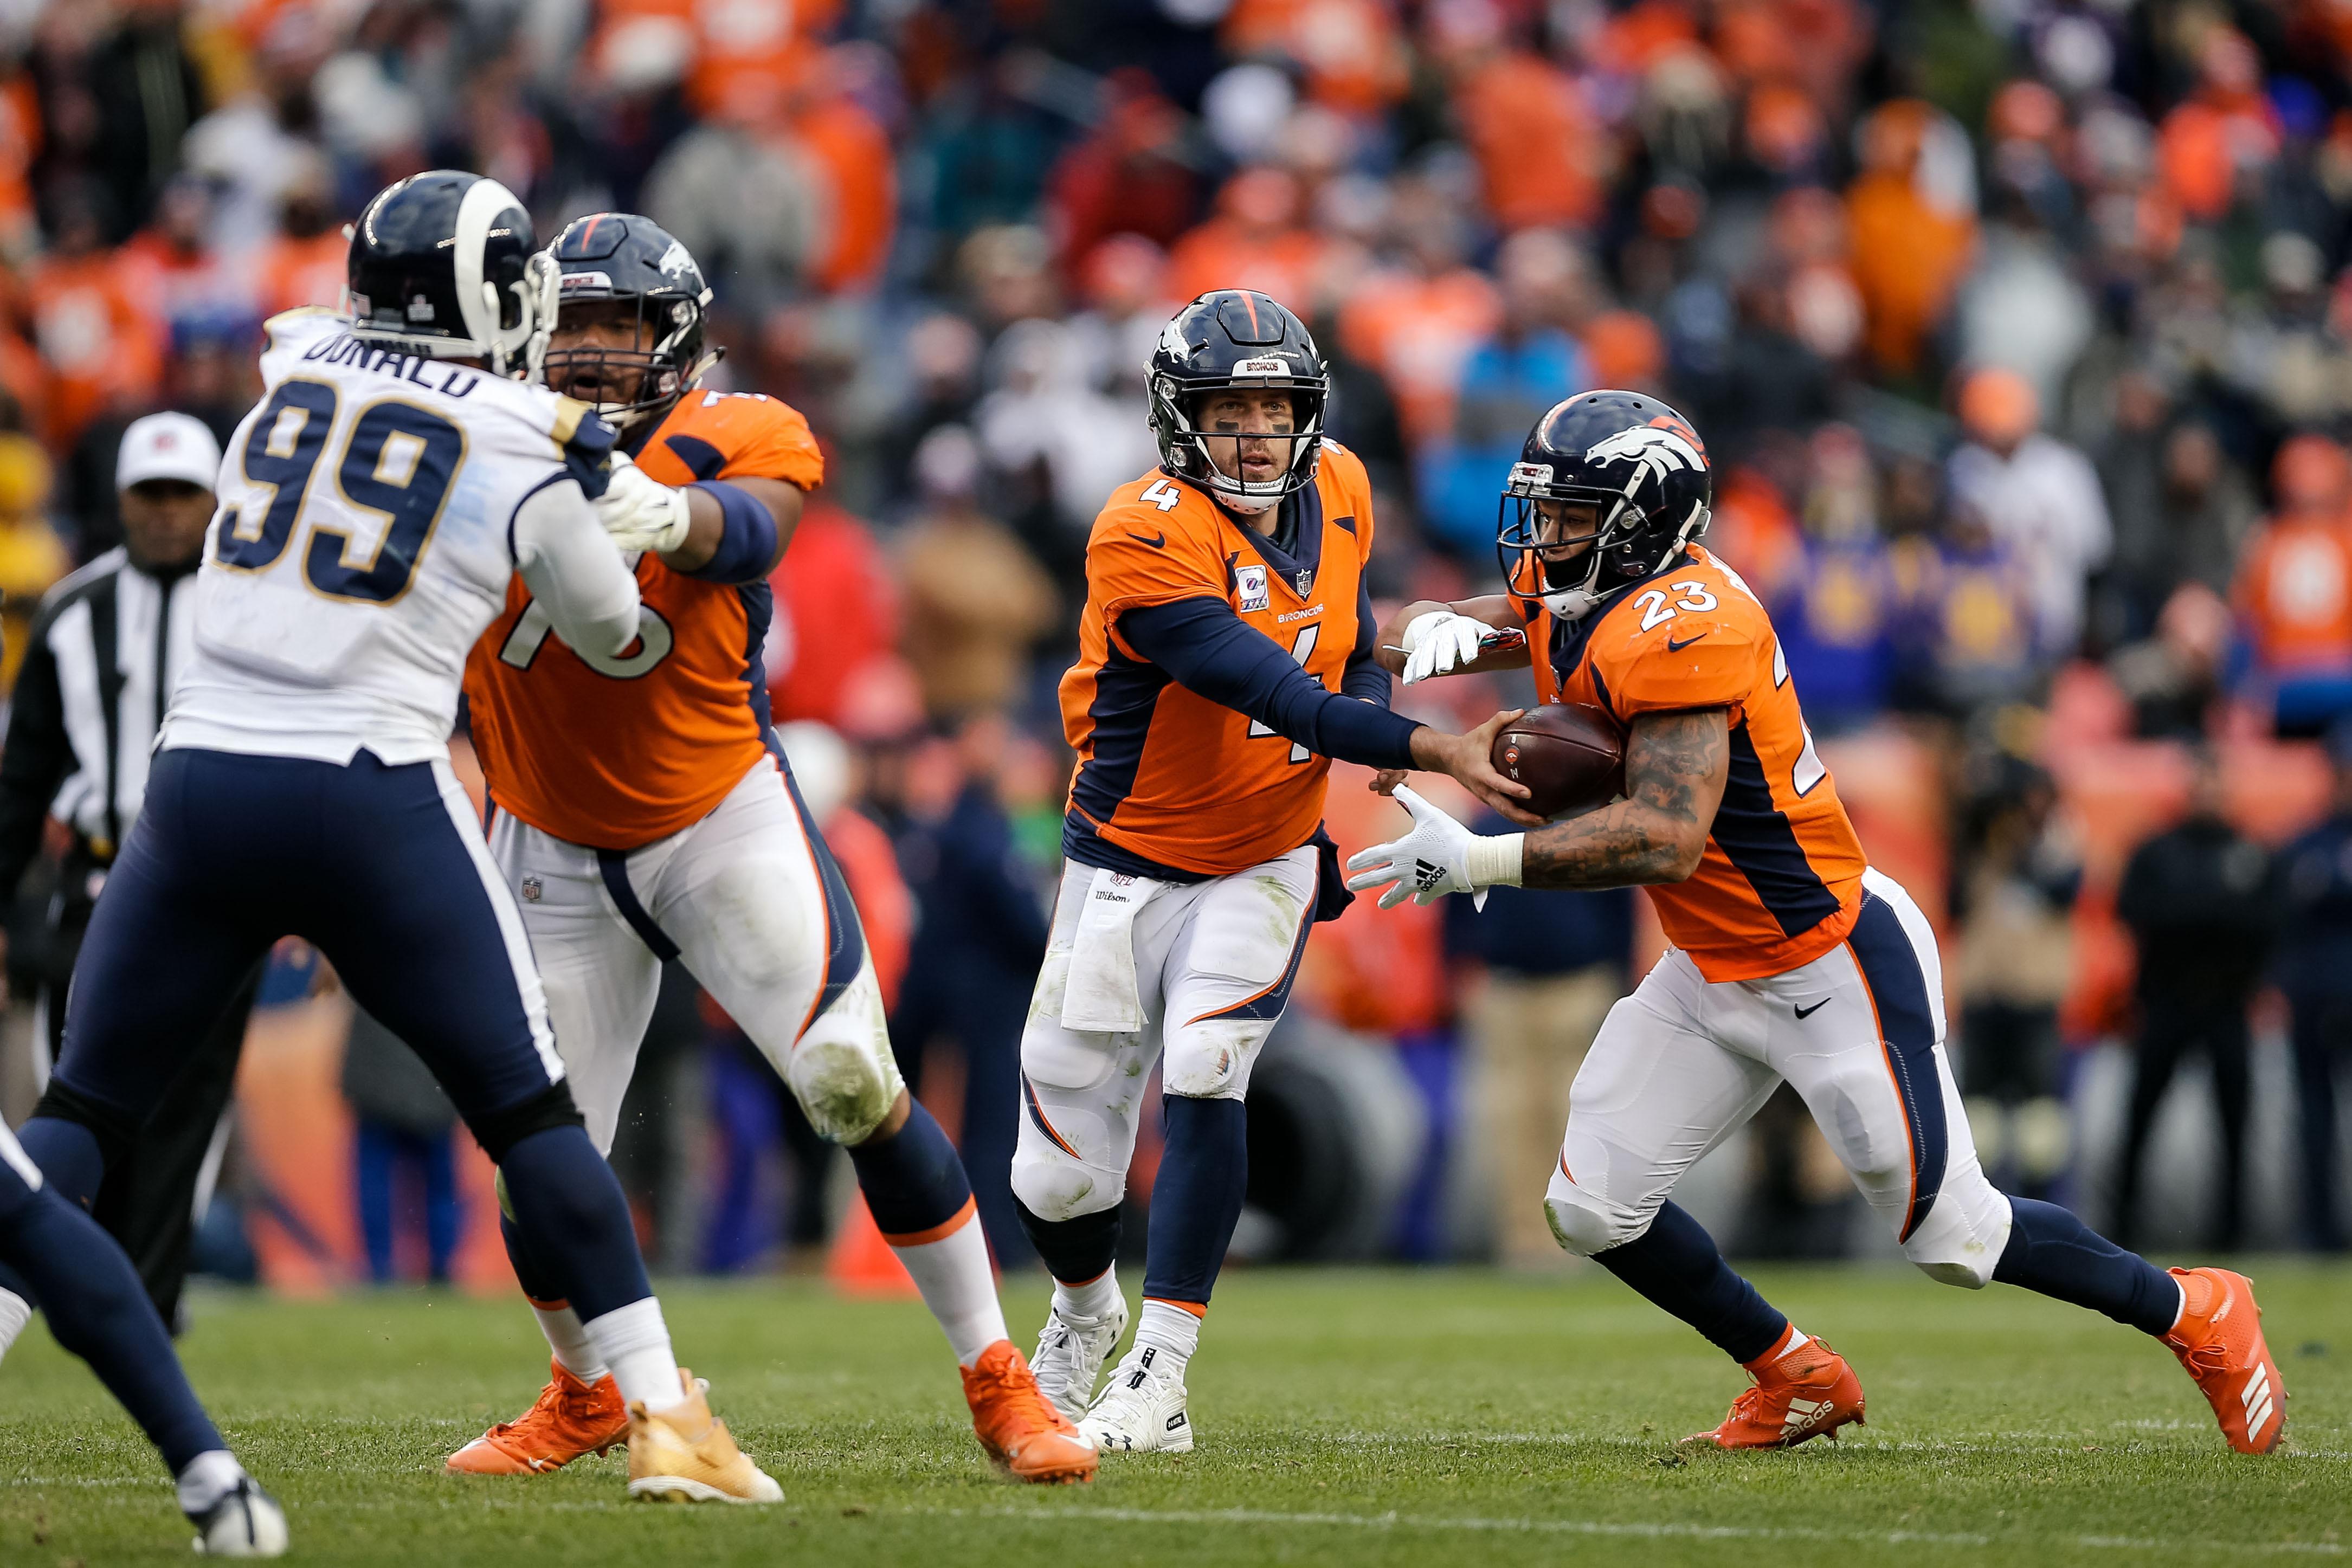 Oct 14 2018 Denver Co Usa Denver Broncos Quarterback Case Keenum 4 Hands The Ball Off To Running Back Devontae Booker 23 As Guard Max Garcia 76